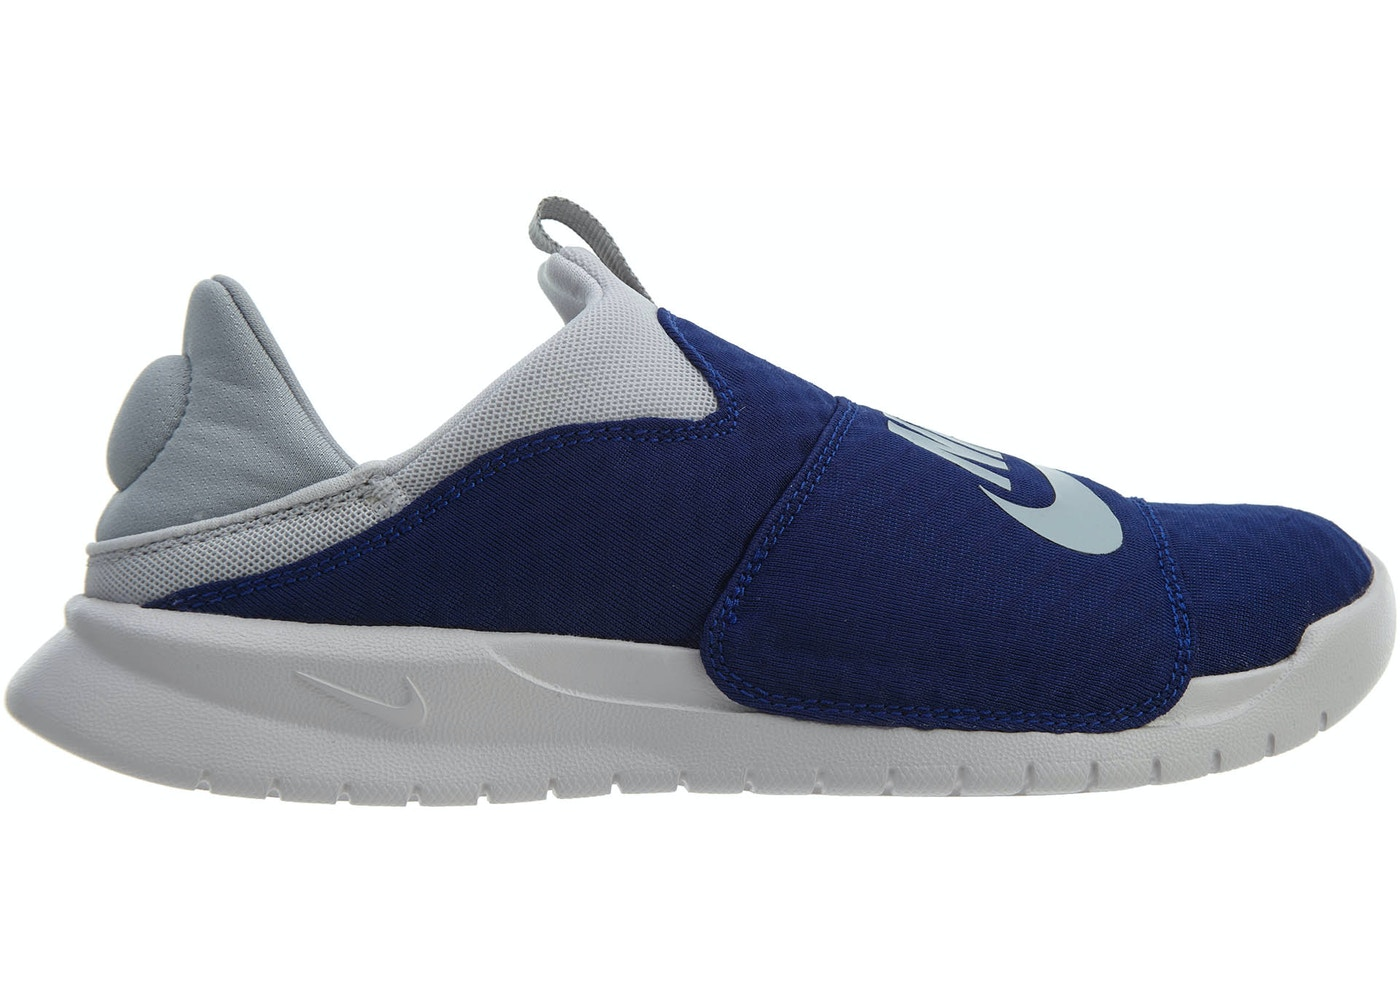 3f69d151da ... SFB 6 Inch Benassi JDI Slide; Nike Benassi Slp Deep Royal Blue Wolf  Grey ...